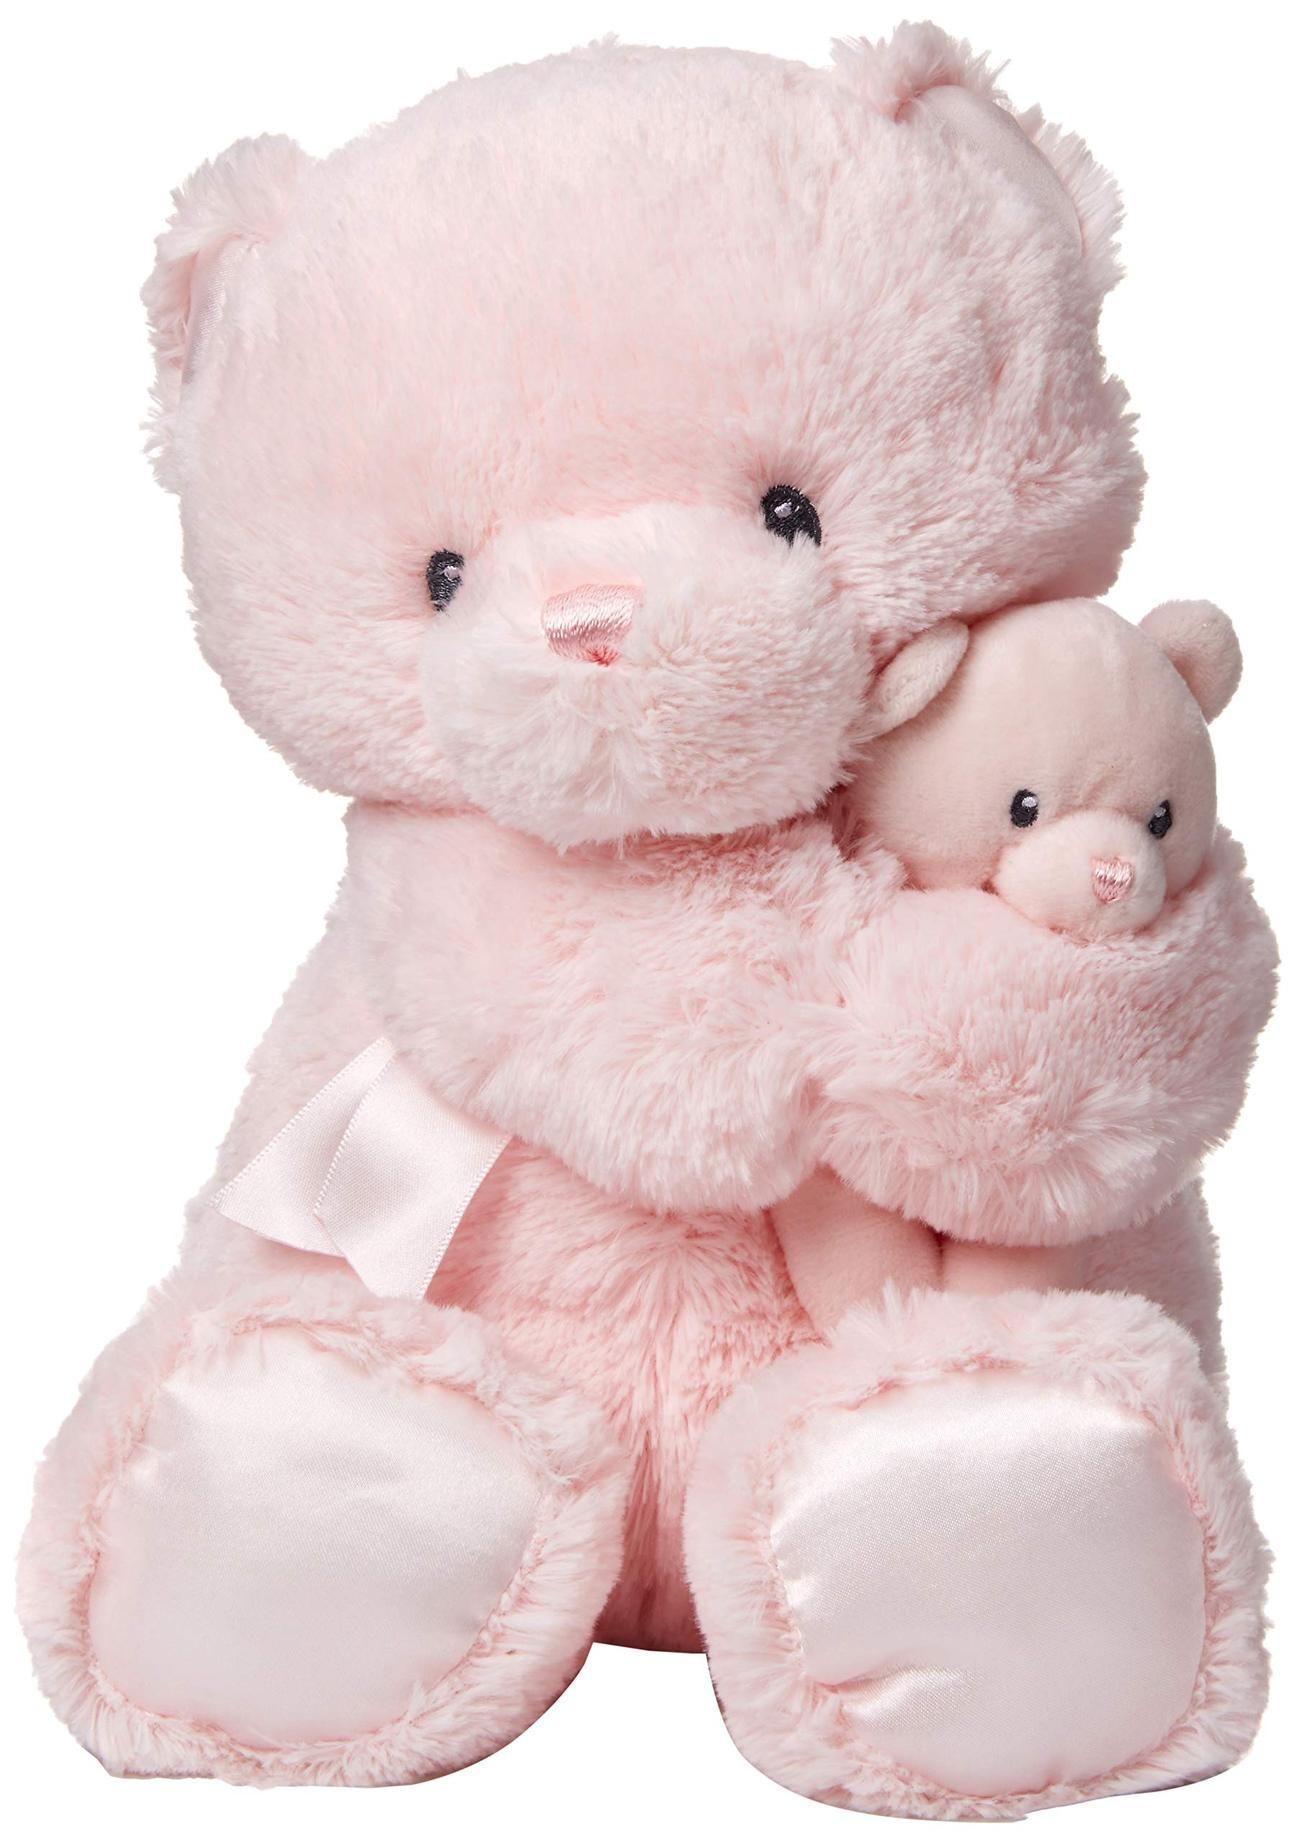 Gund Momma And Baby Teddy Bear Stuffed Animal Plush Rattle Pink 11 Teddy Bear Stuffed Animal Bear Stuffed Animal Baby Teddy Bear [ 1842 x 1296 Pixel ]